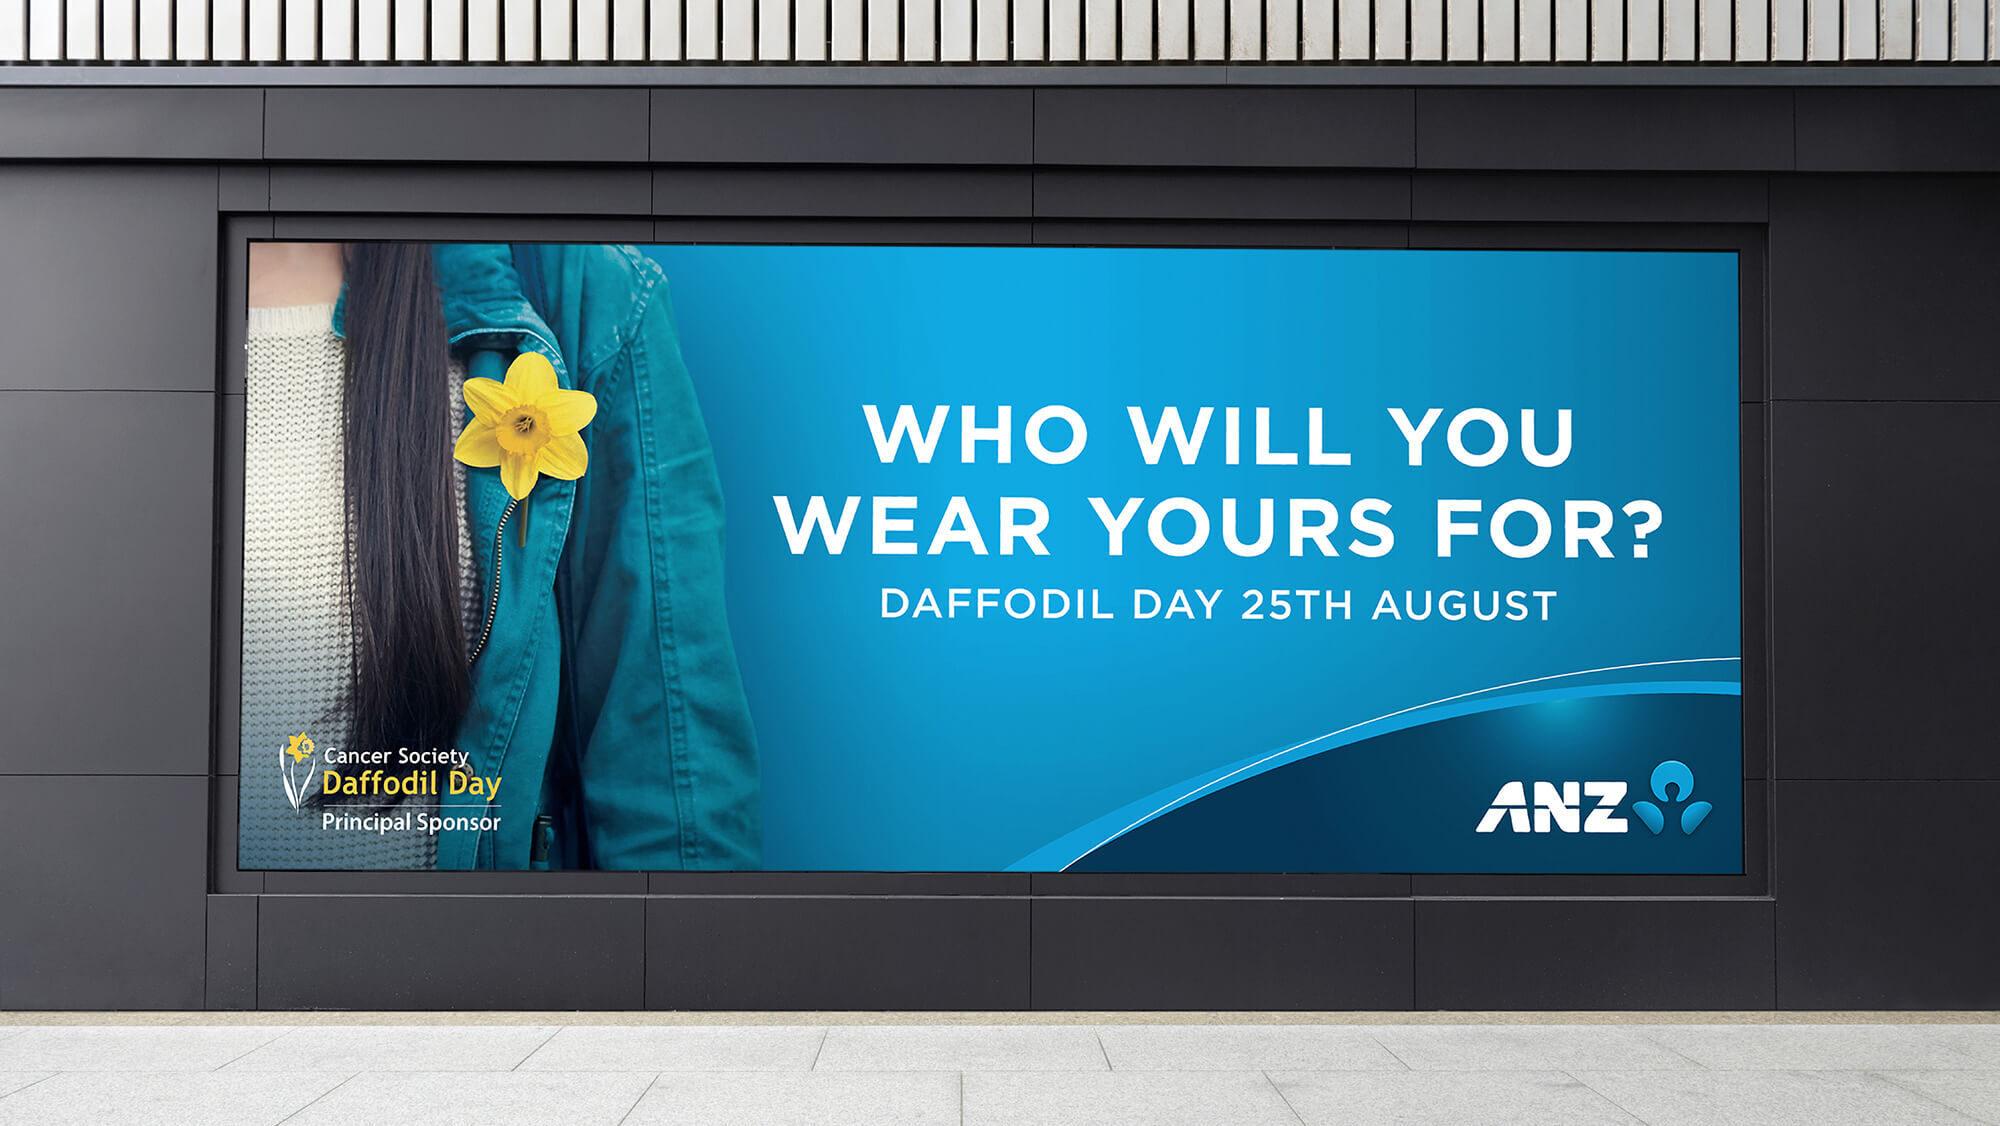 ANZ Brand Guardians Daffodil Day Billboard